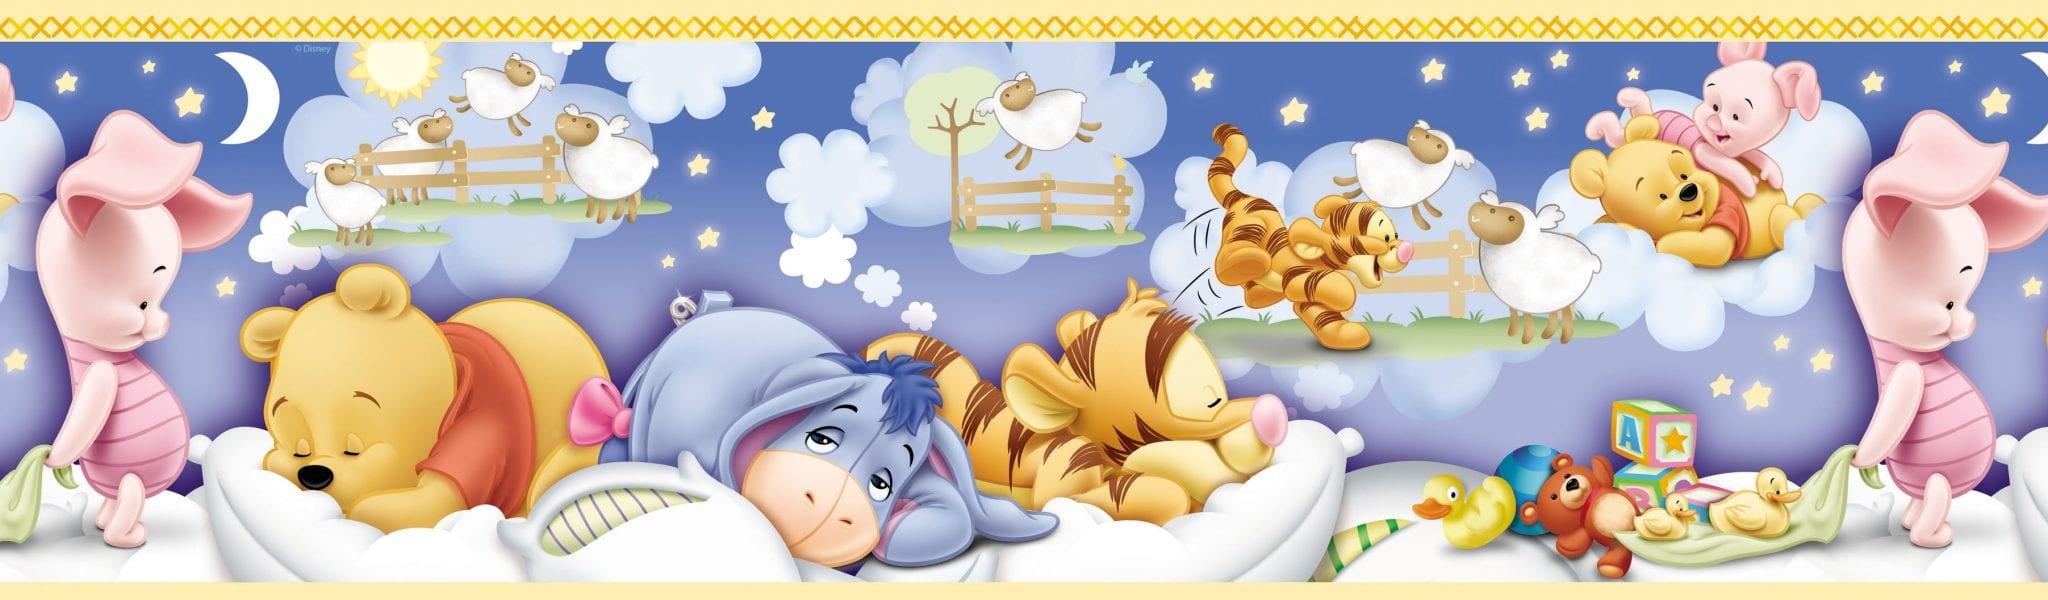 Guarda autoadhesiva pooh disney 1141 0 cinthiasa for Winnie pooh ka che